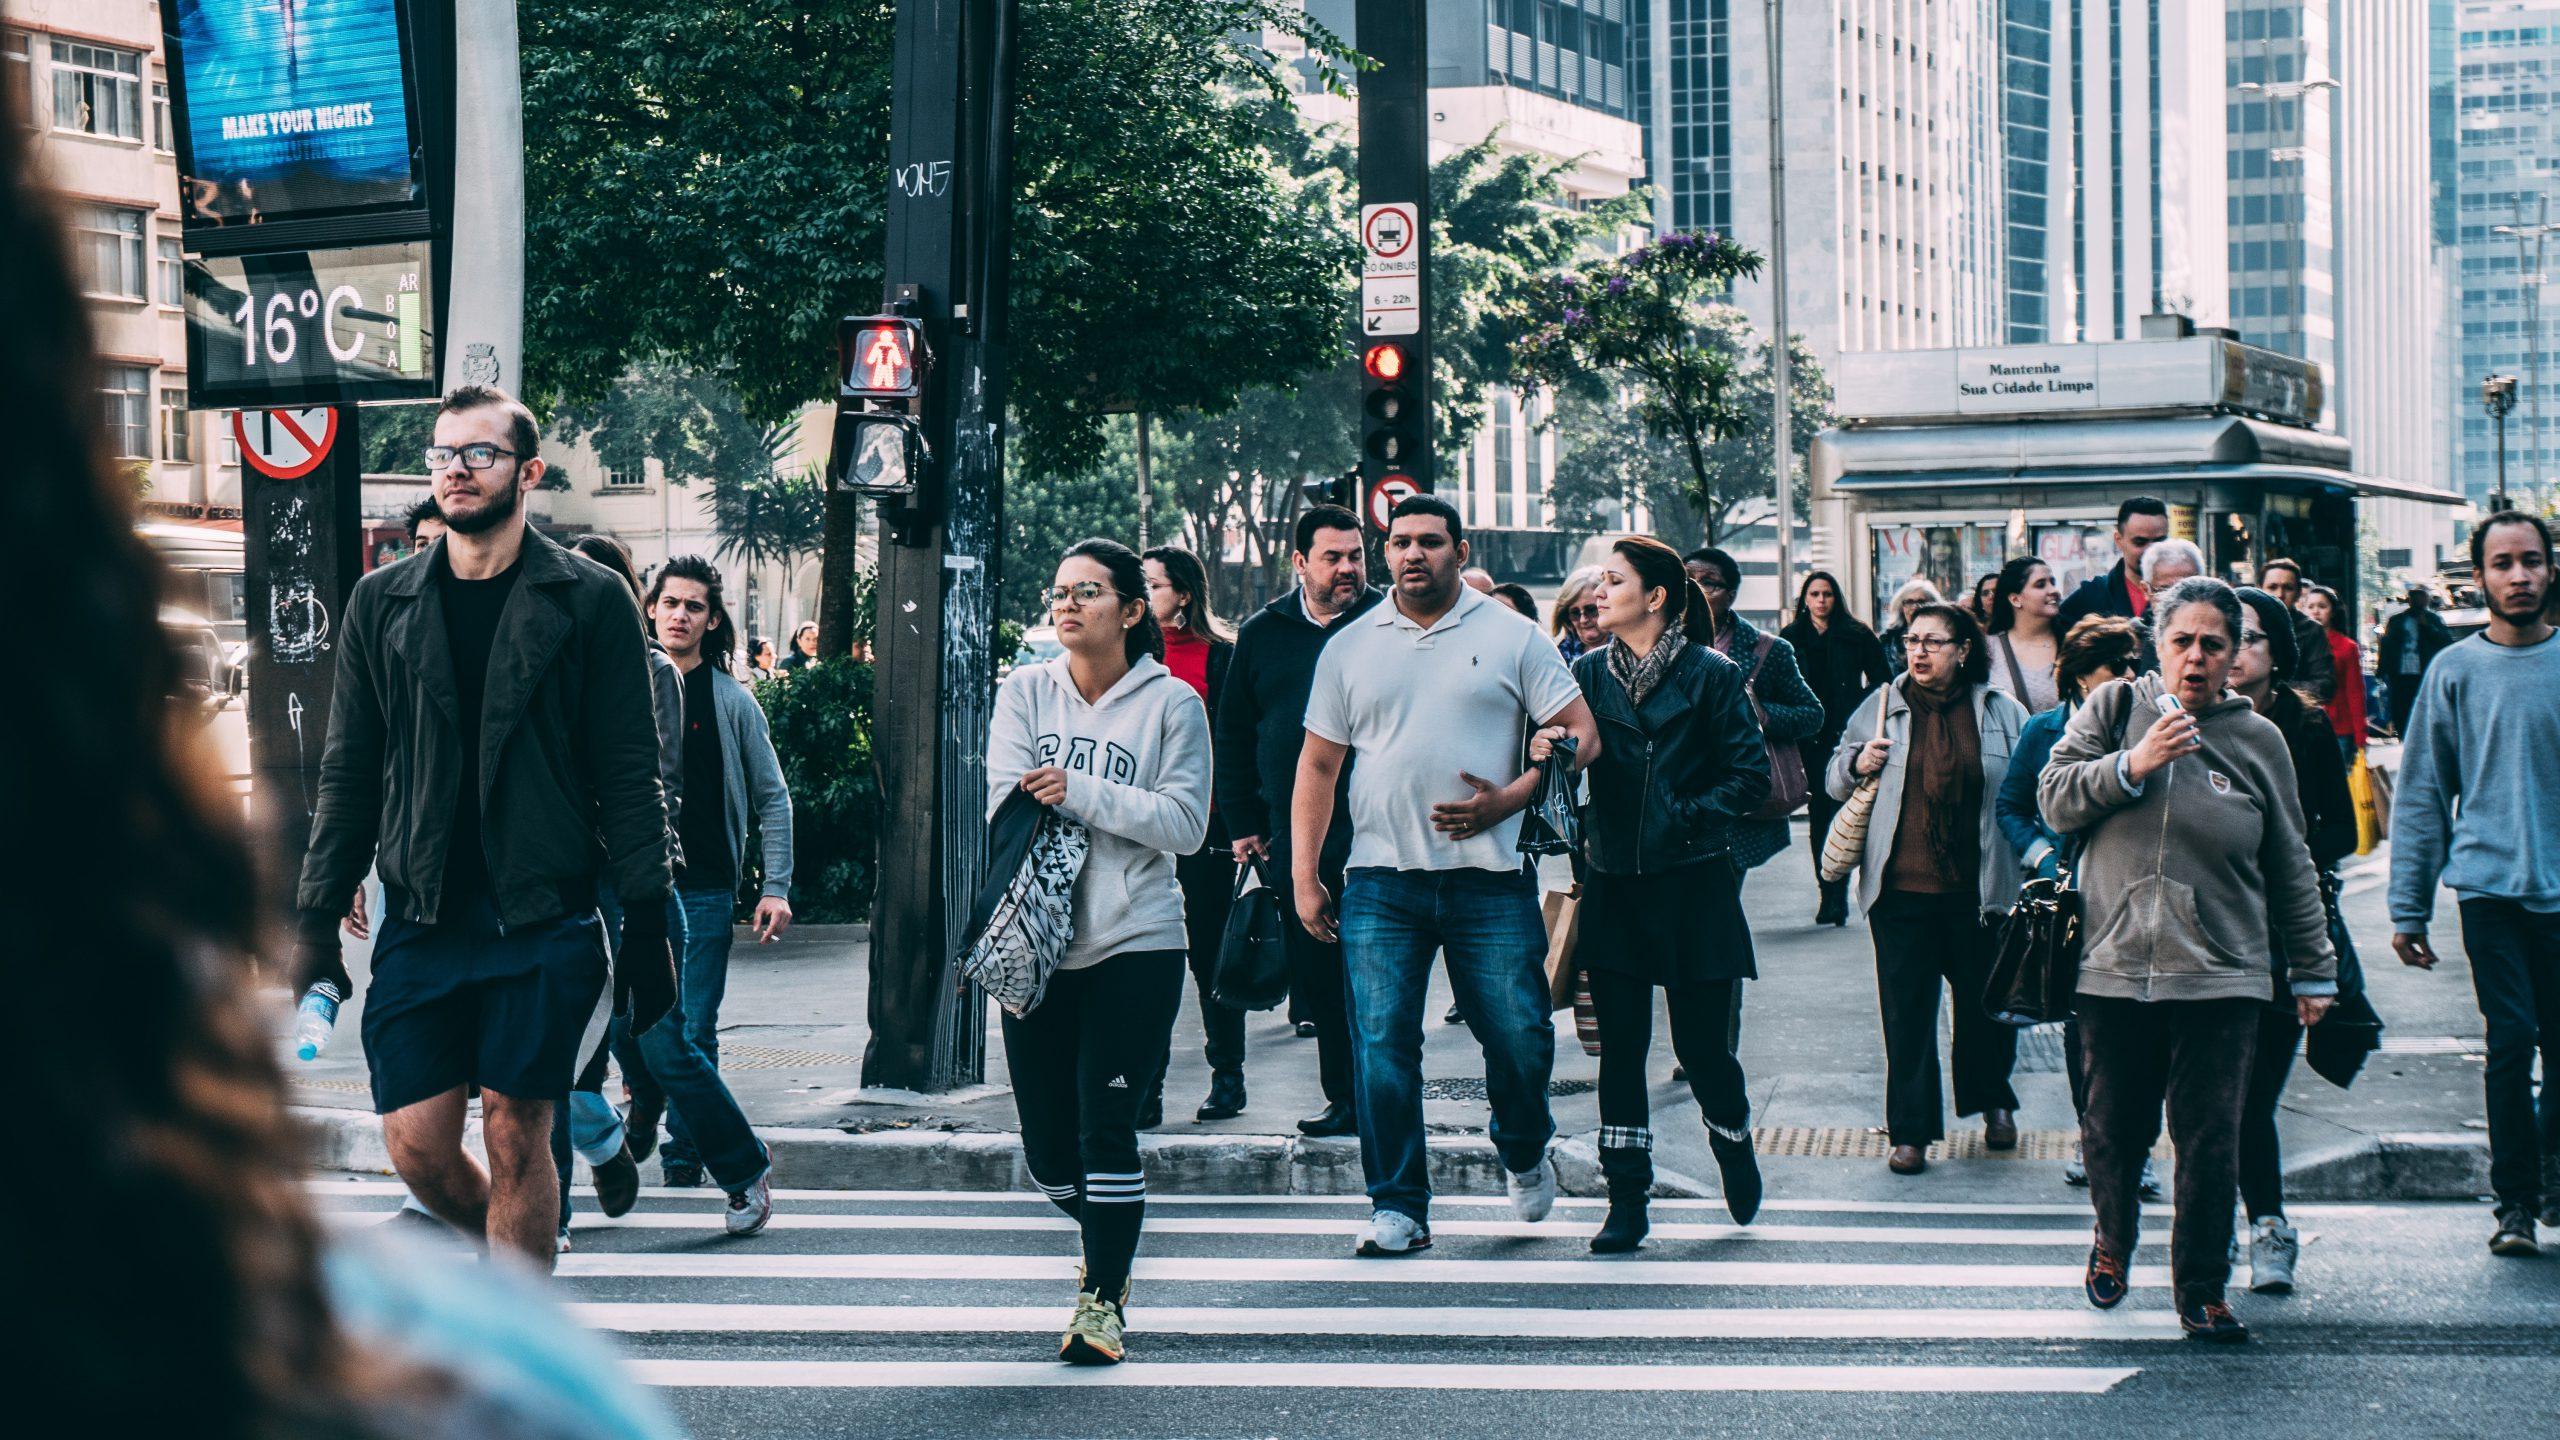 city-community-crossing-109919